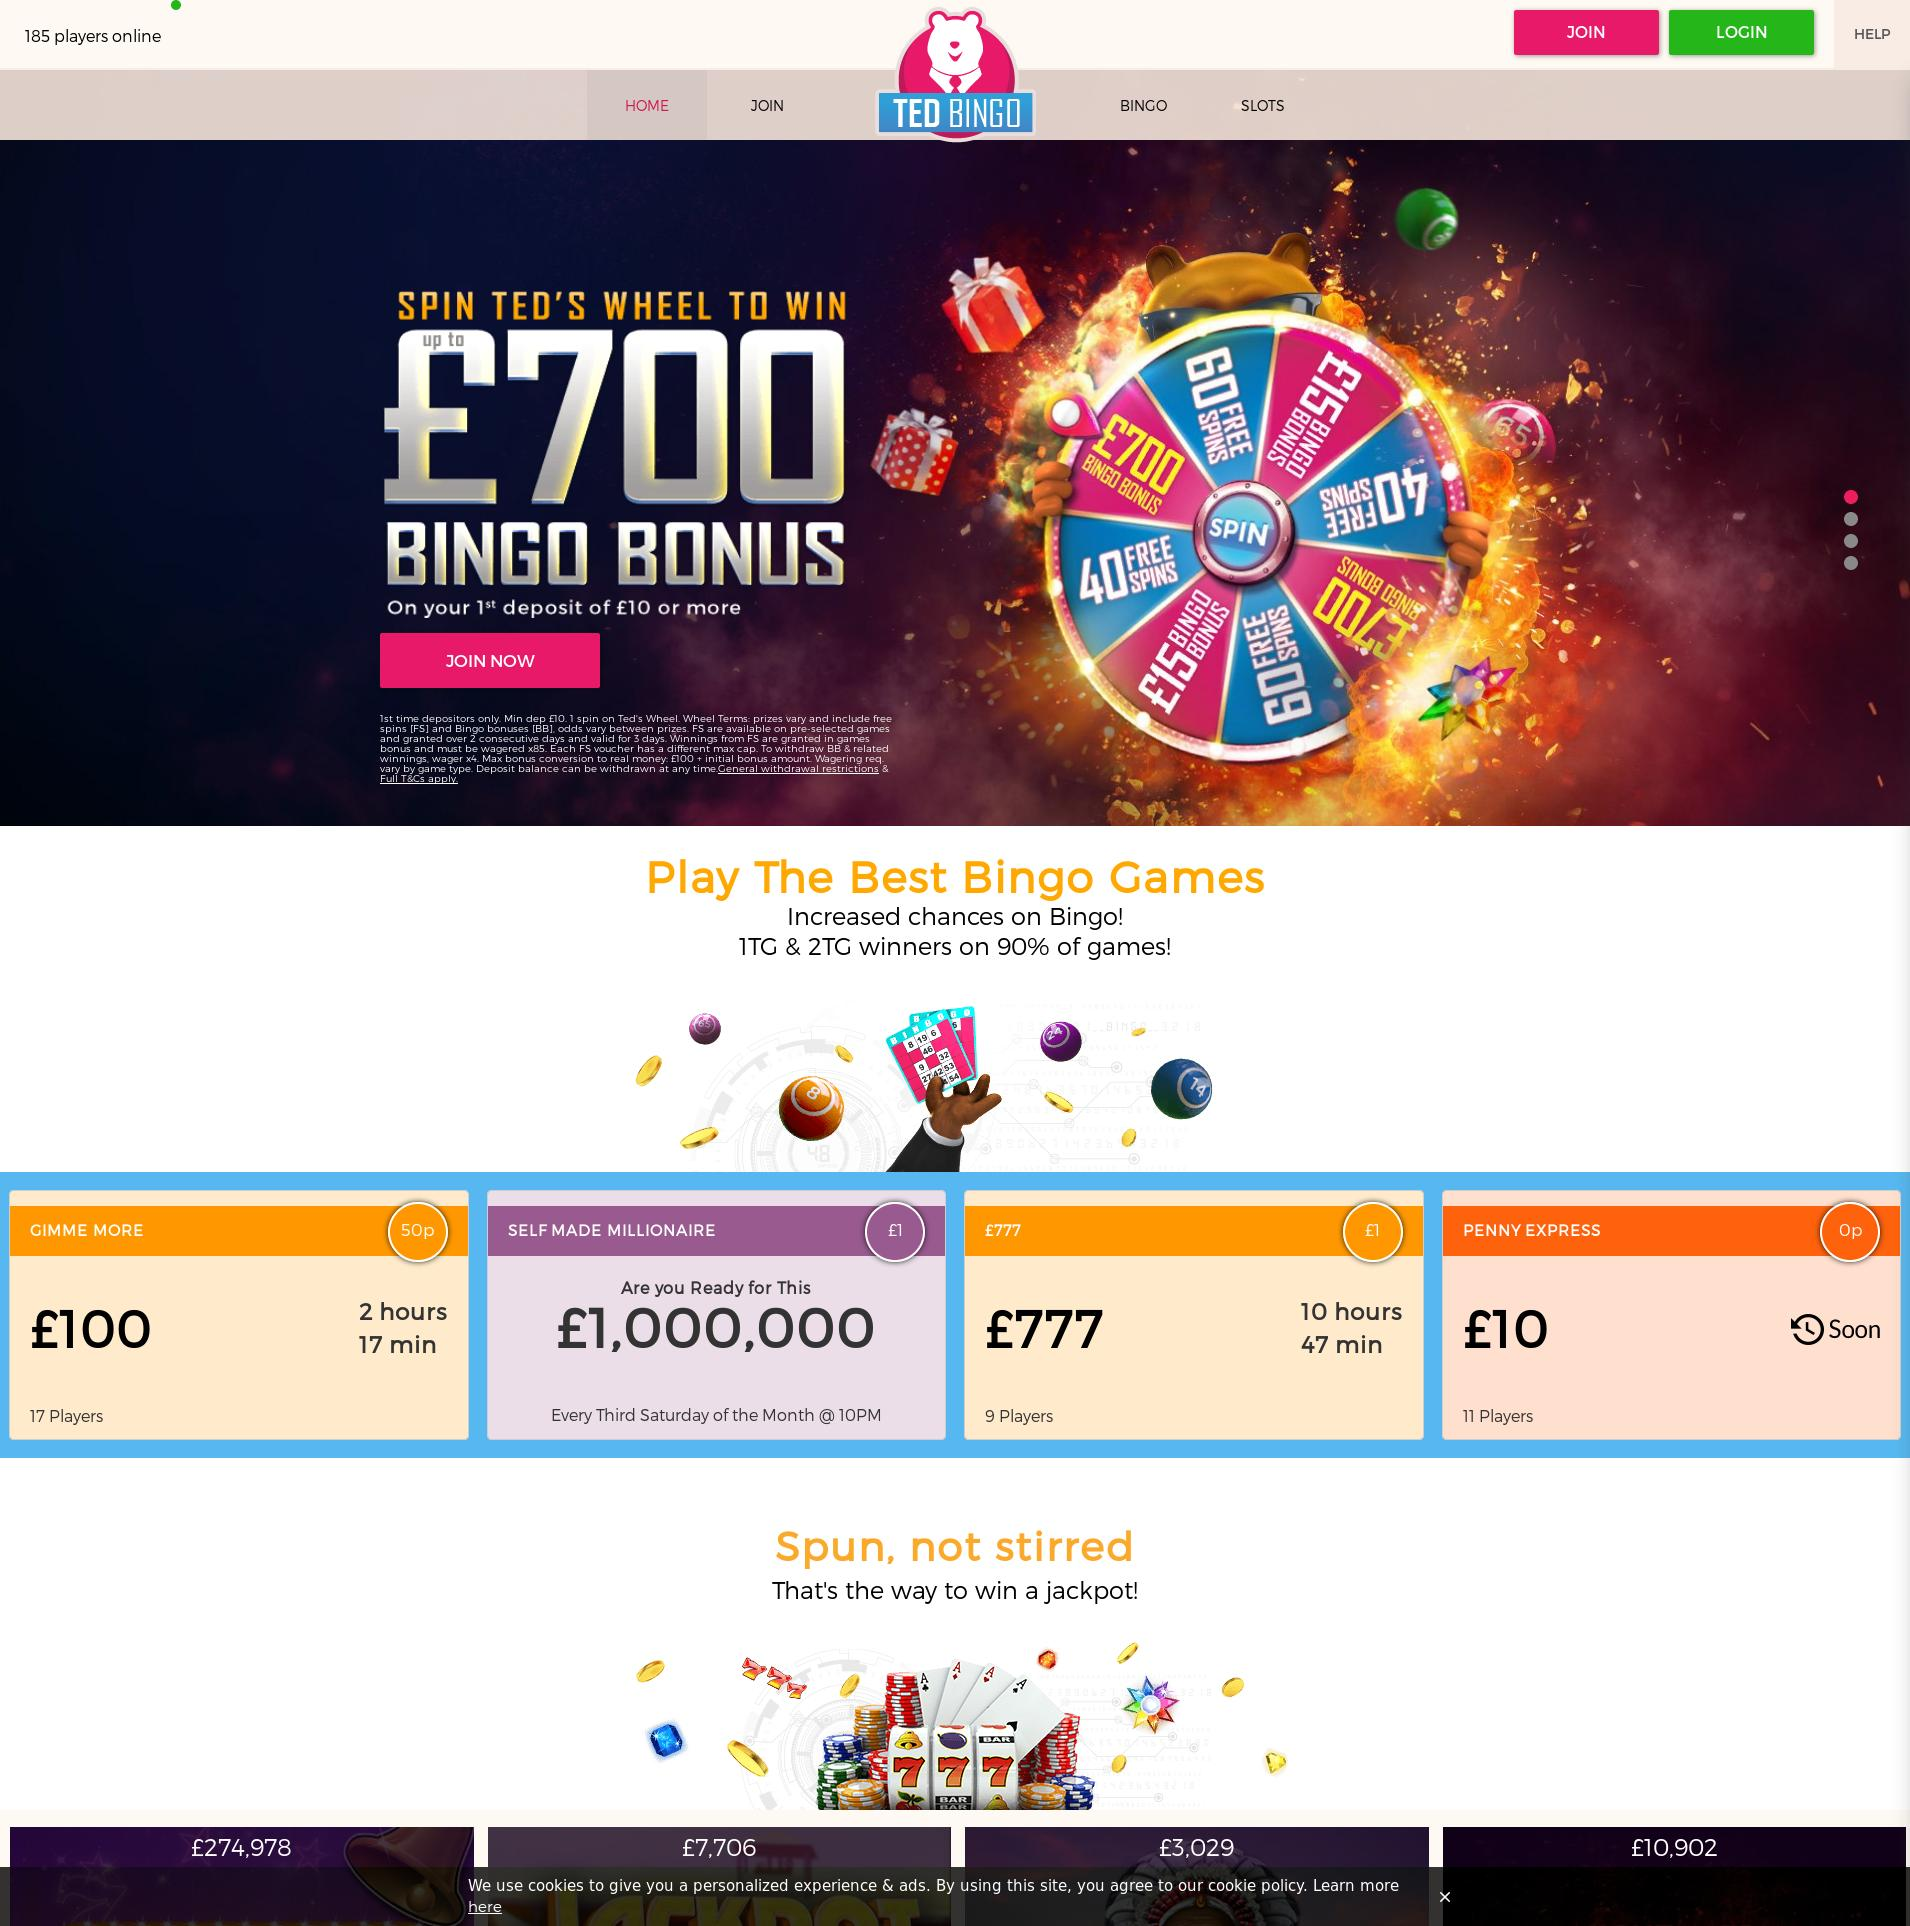 Casino screen Lobby 2020-05-28 for United Kingdom